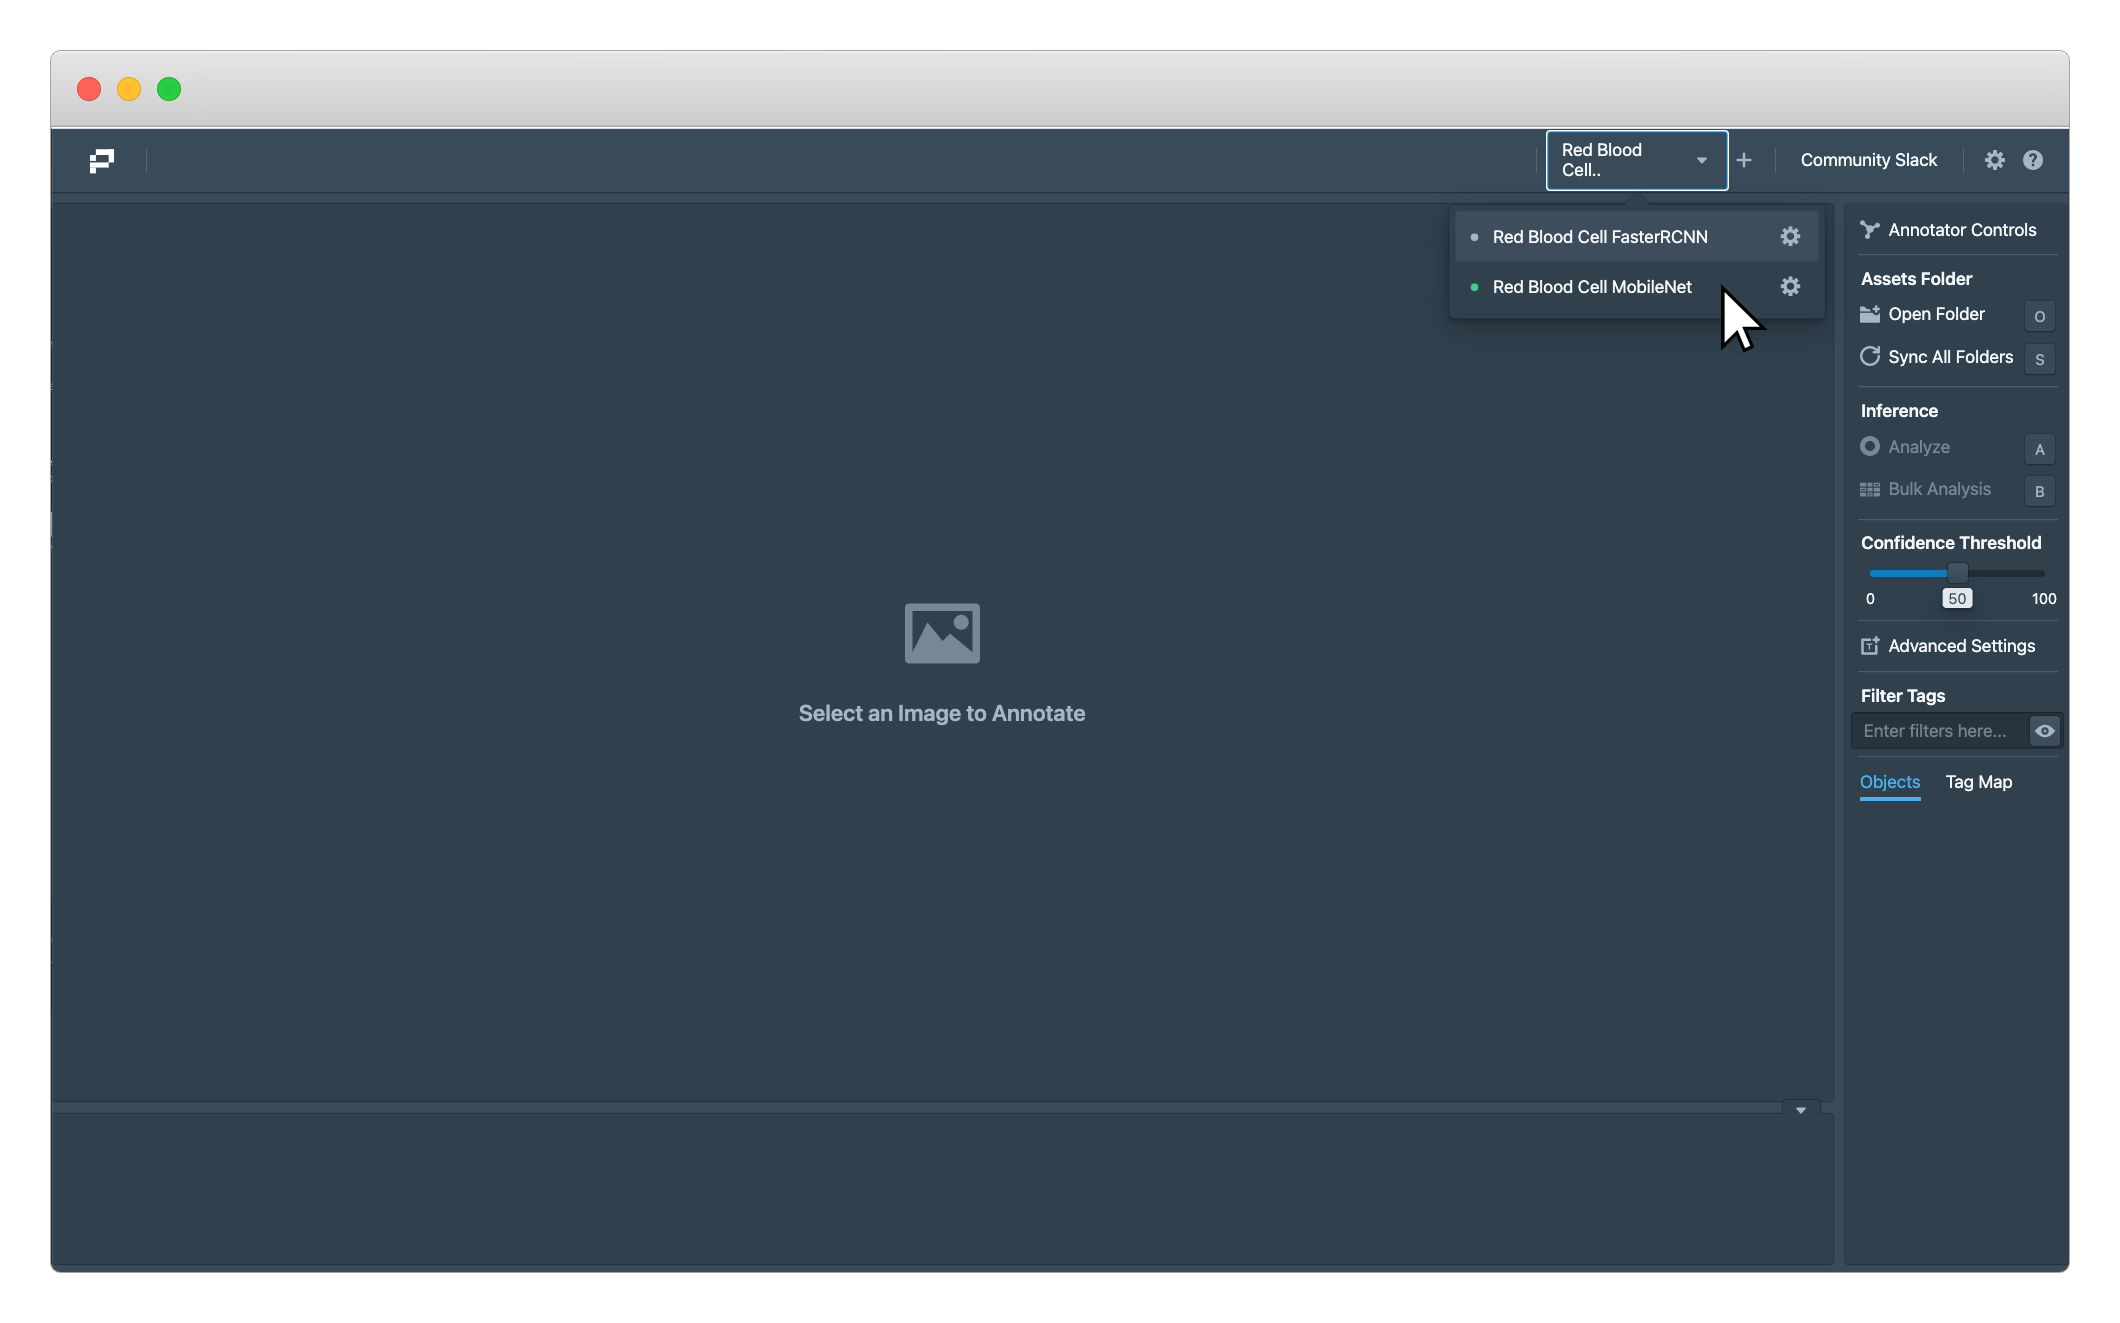 Loading Model on Portal